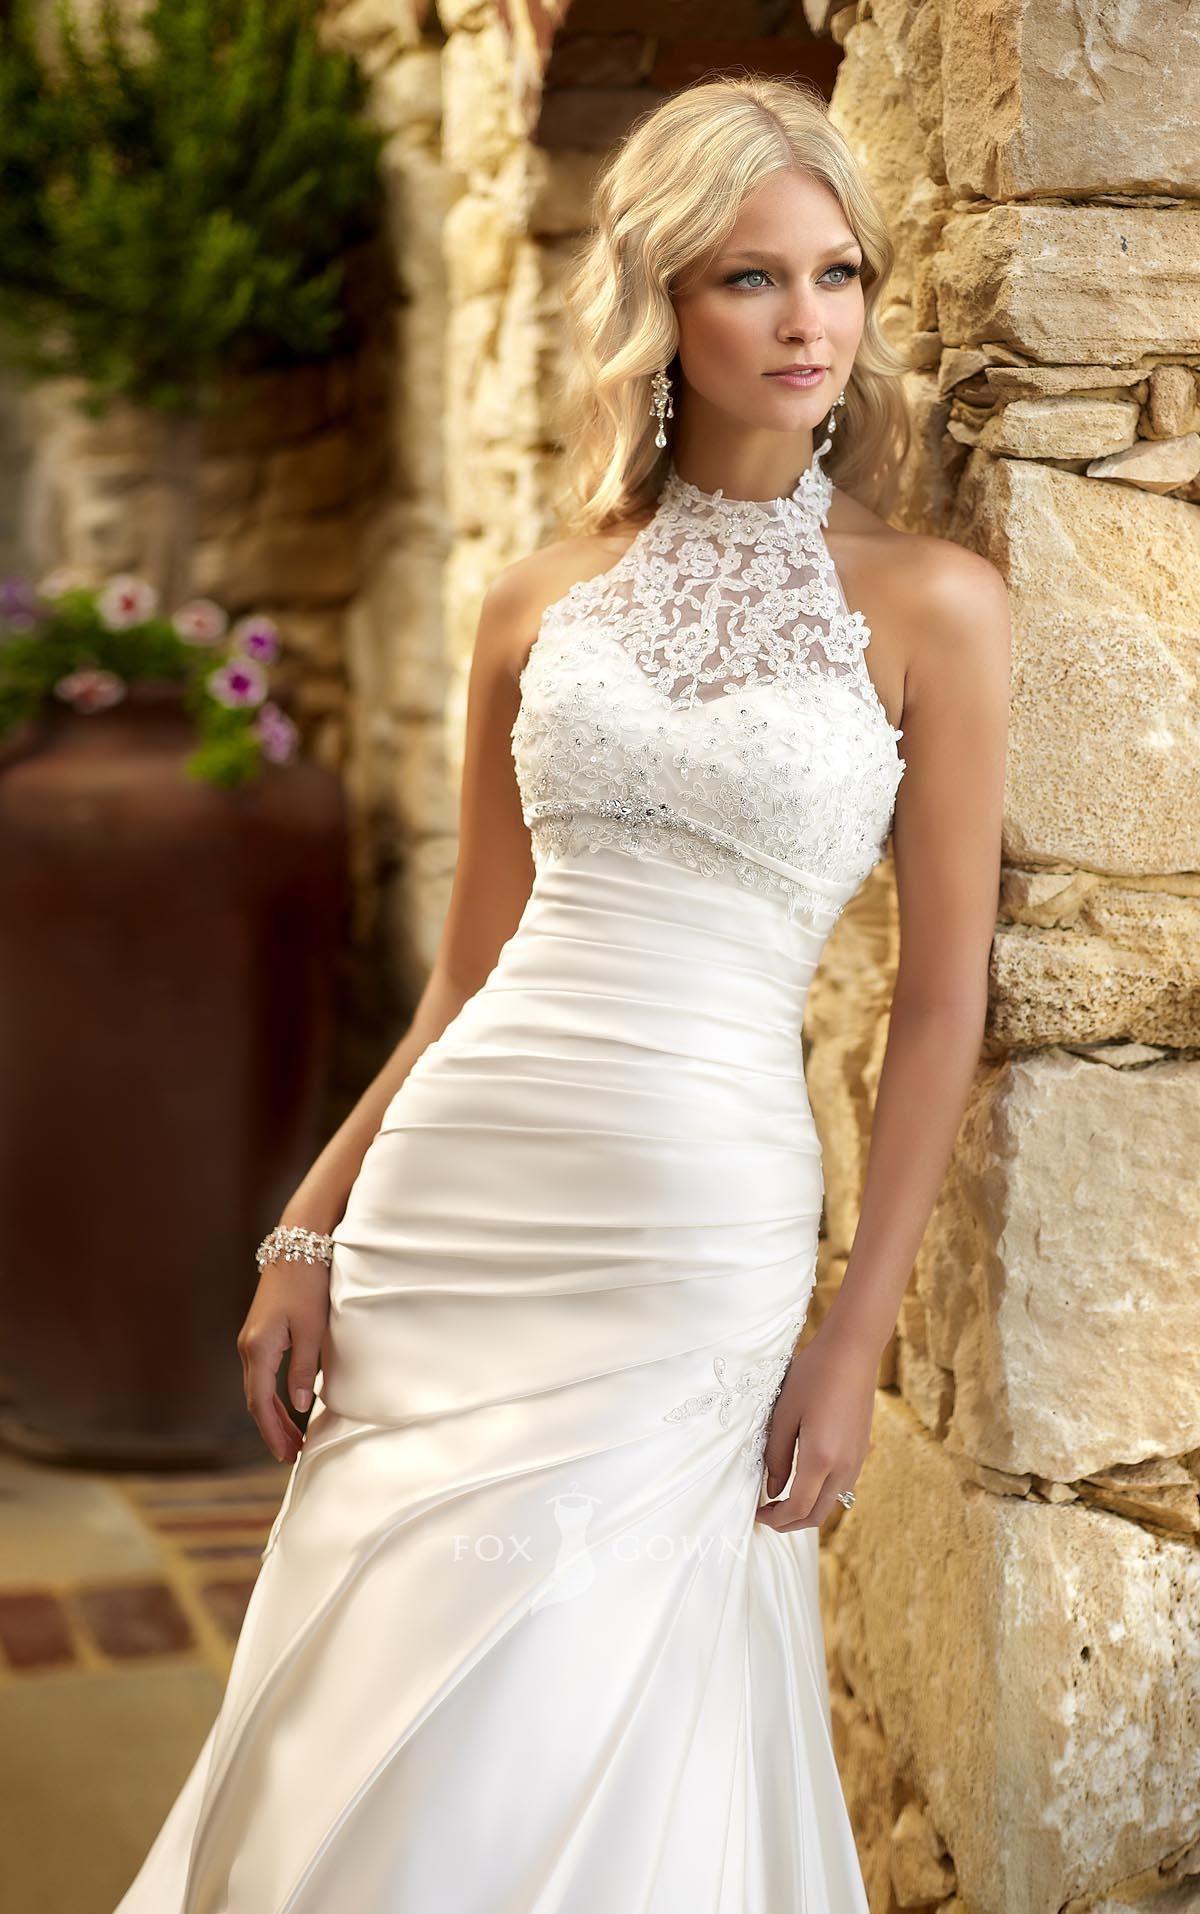 best wedding dress 22 Must See Spring Wedding Dress Trends